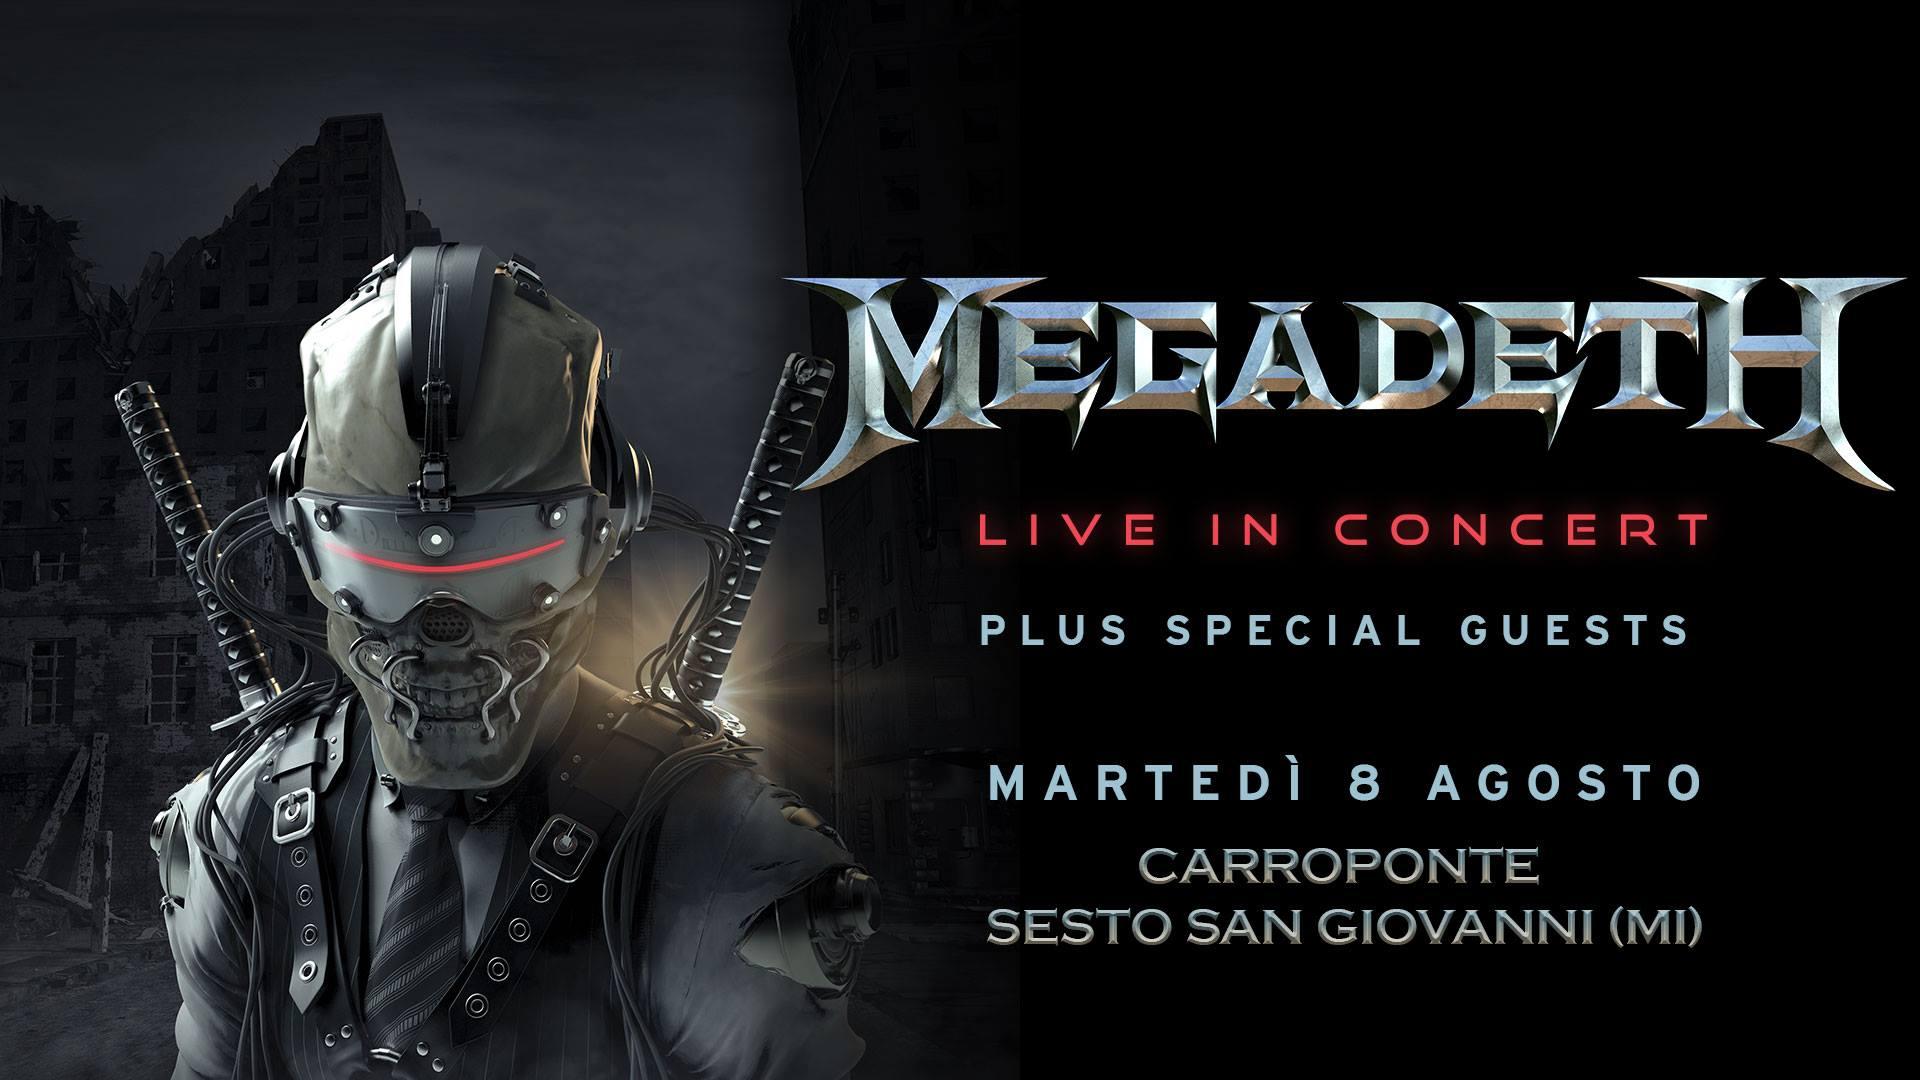 Megadeth - Unica data in Italia